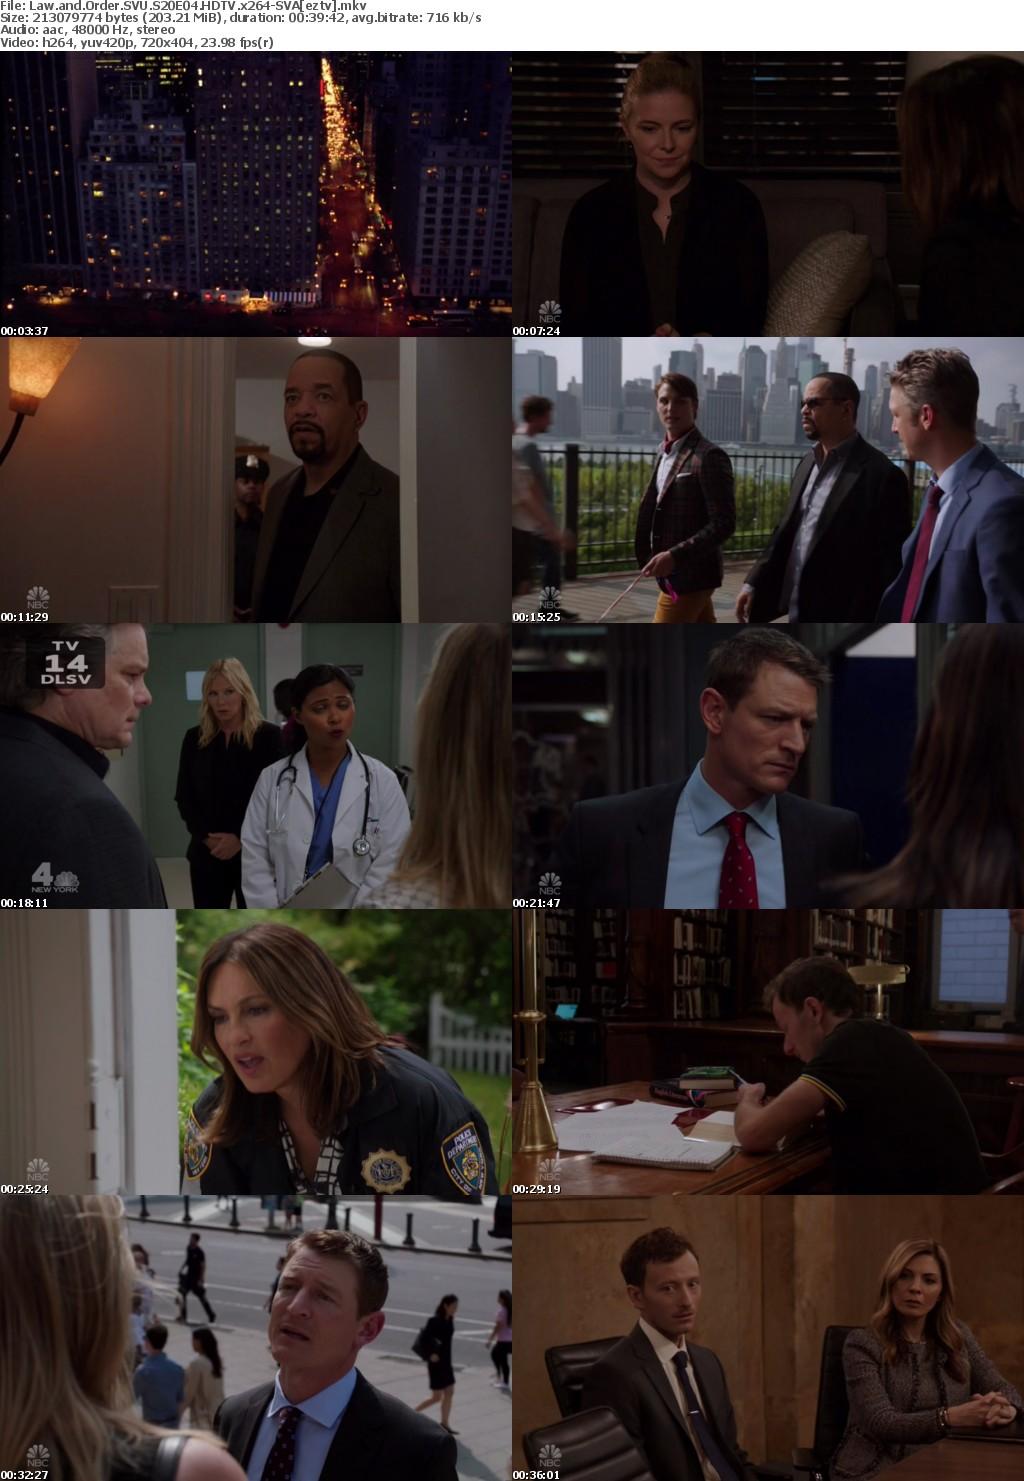 Law and Order SVU S20E04 HDTV x264-SVA